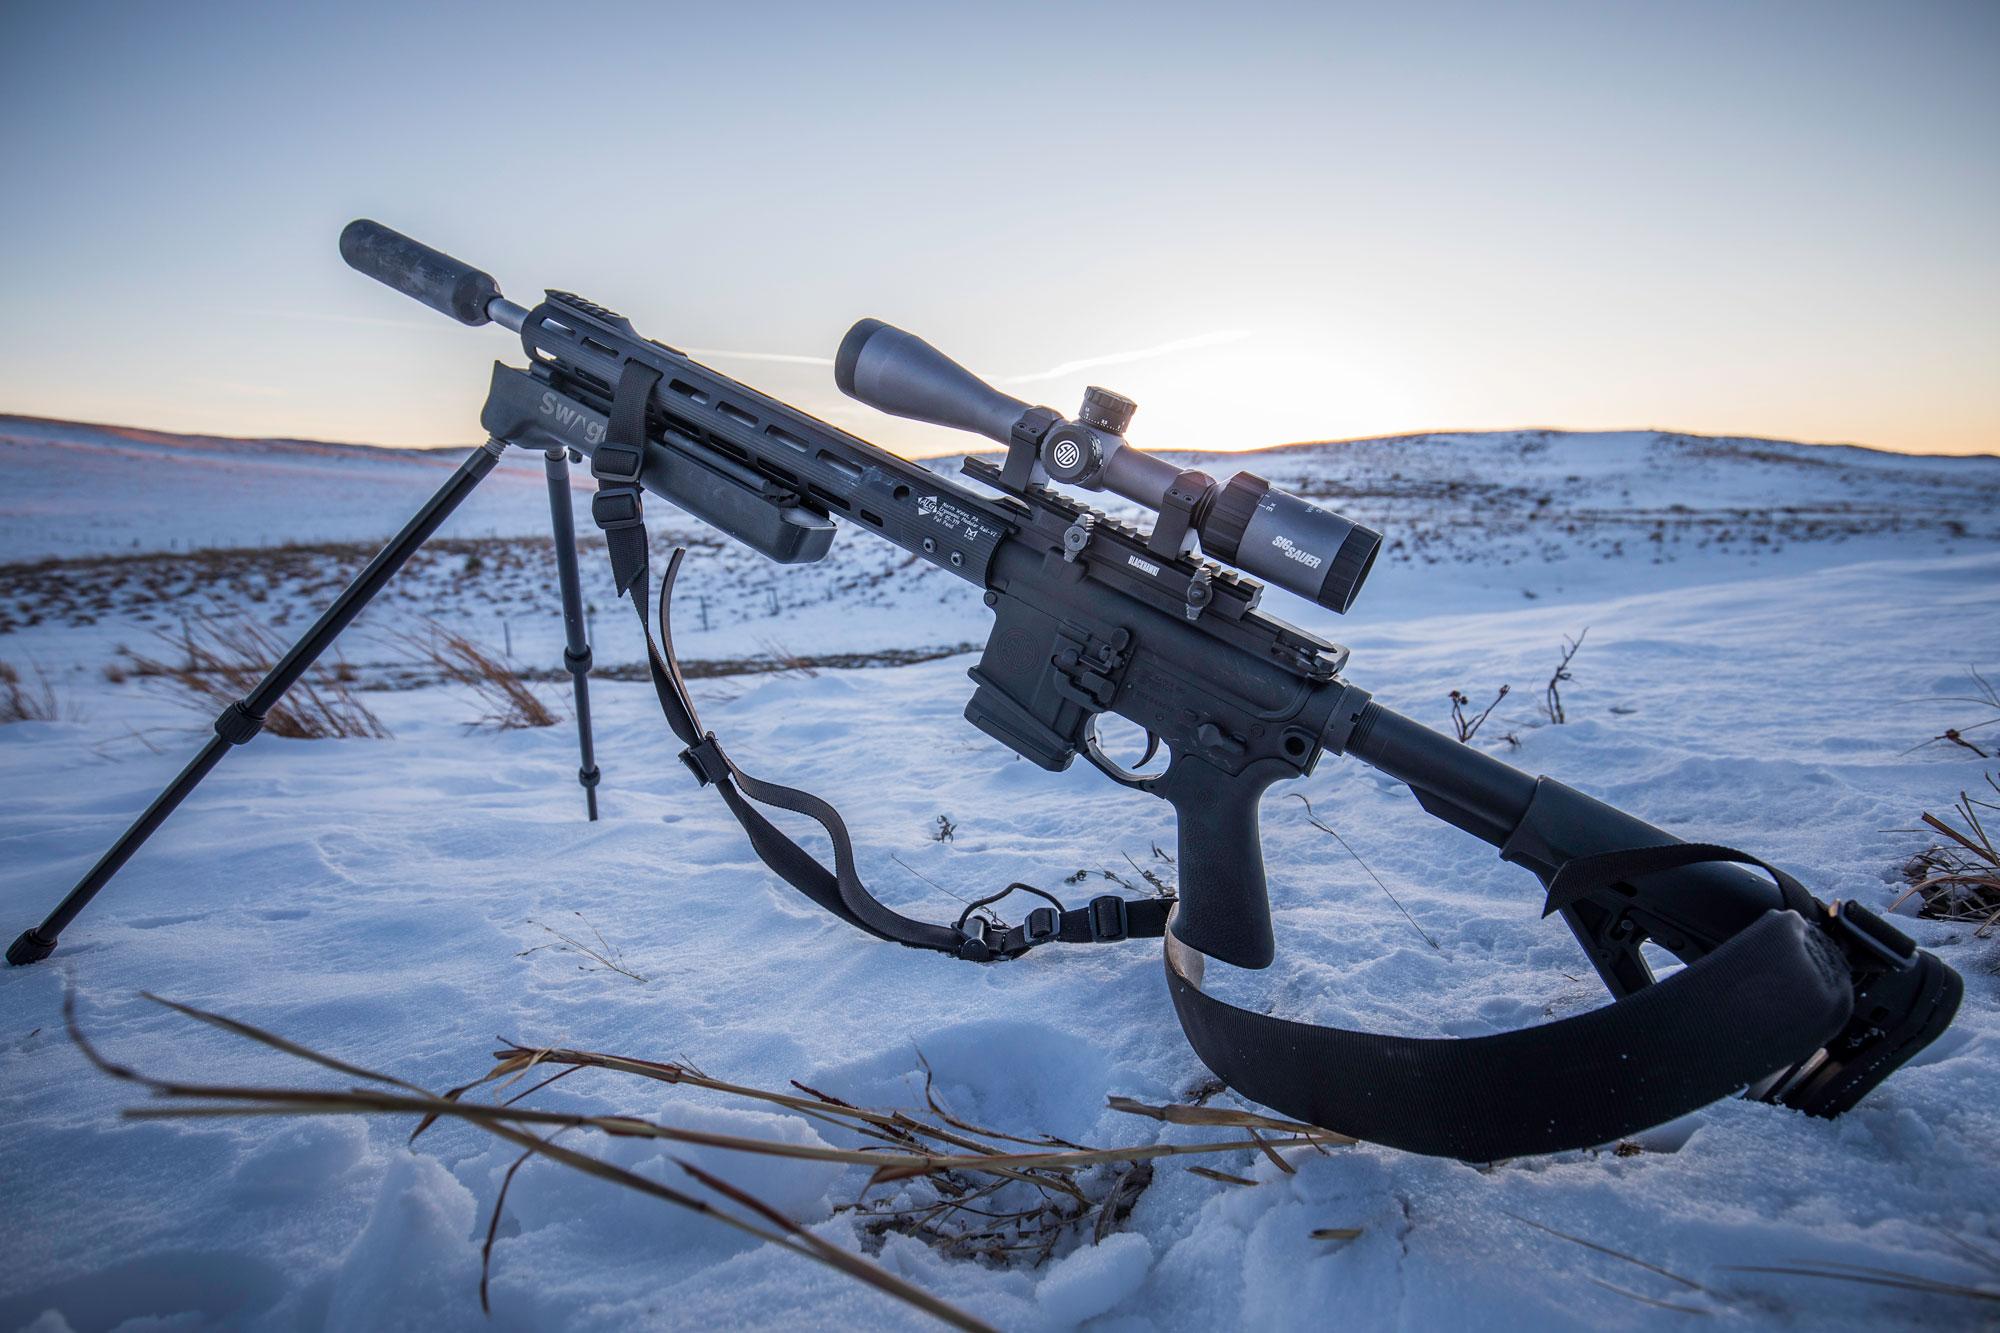 Ultimate Predator Rifle setup - SIG M400 Predator